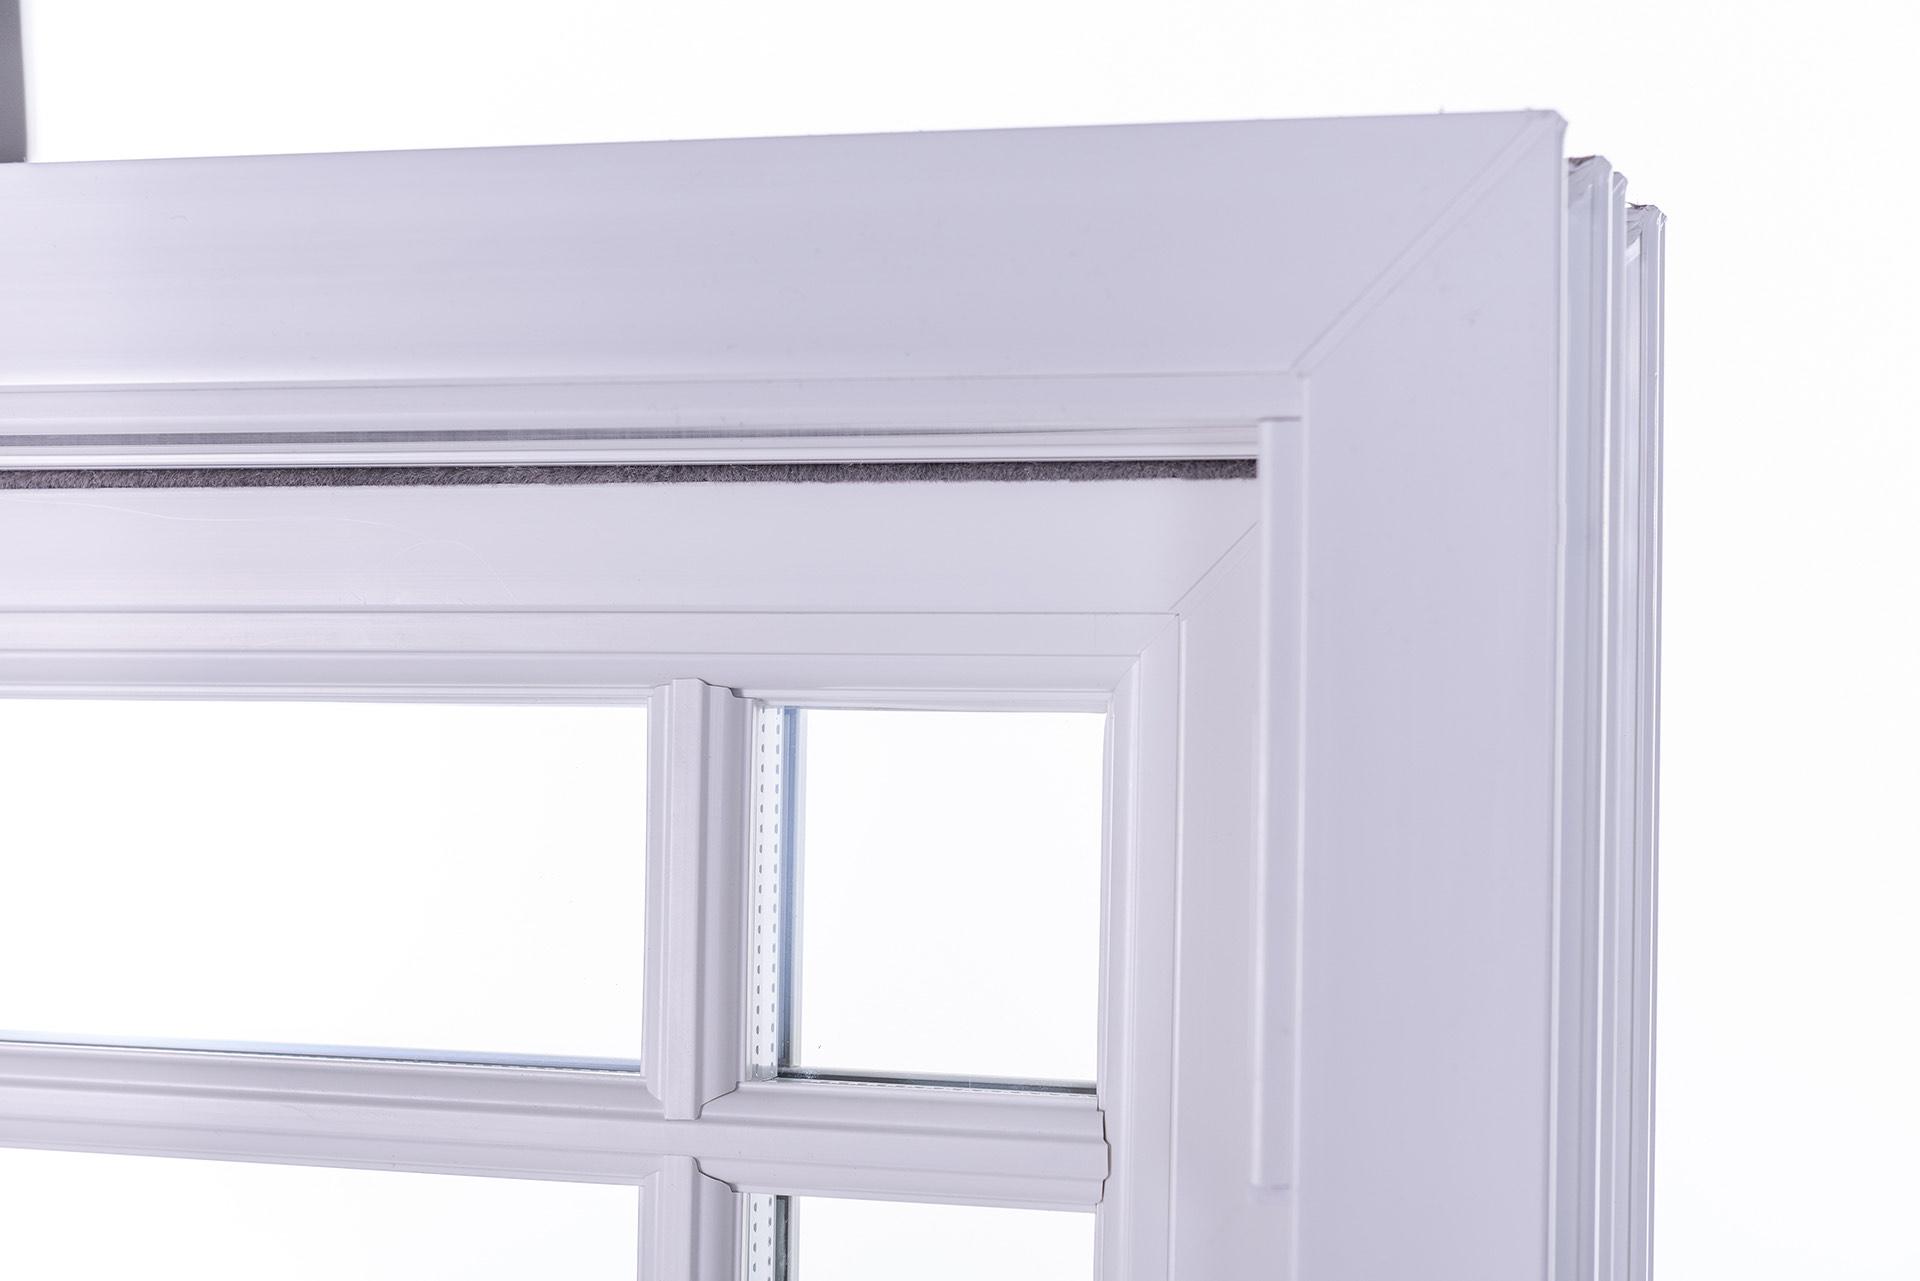 Sash Windows Welded Joints